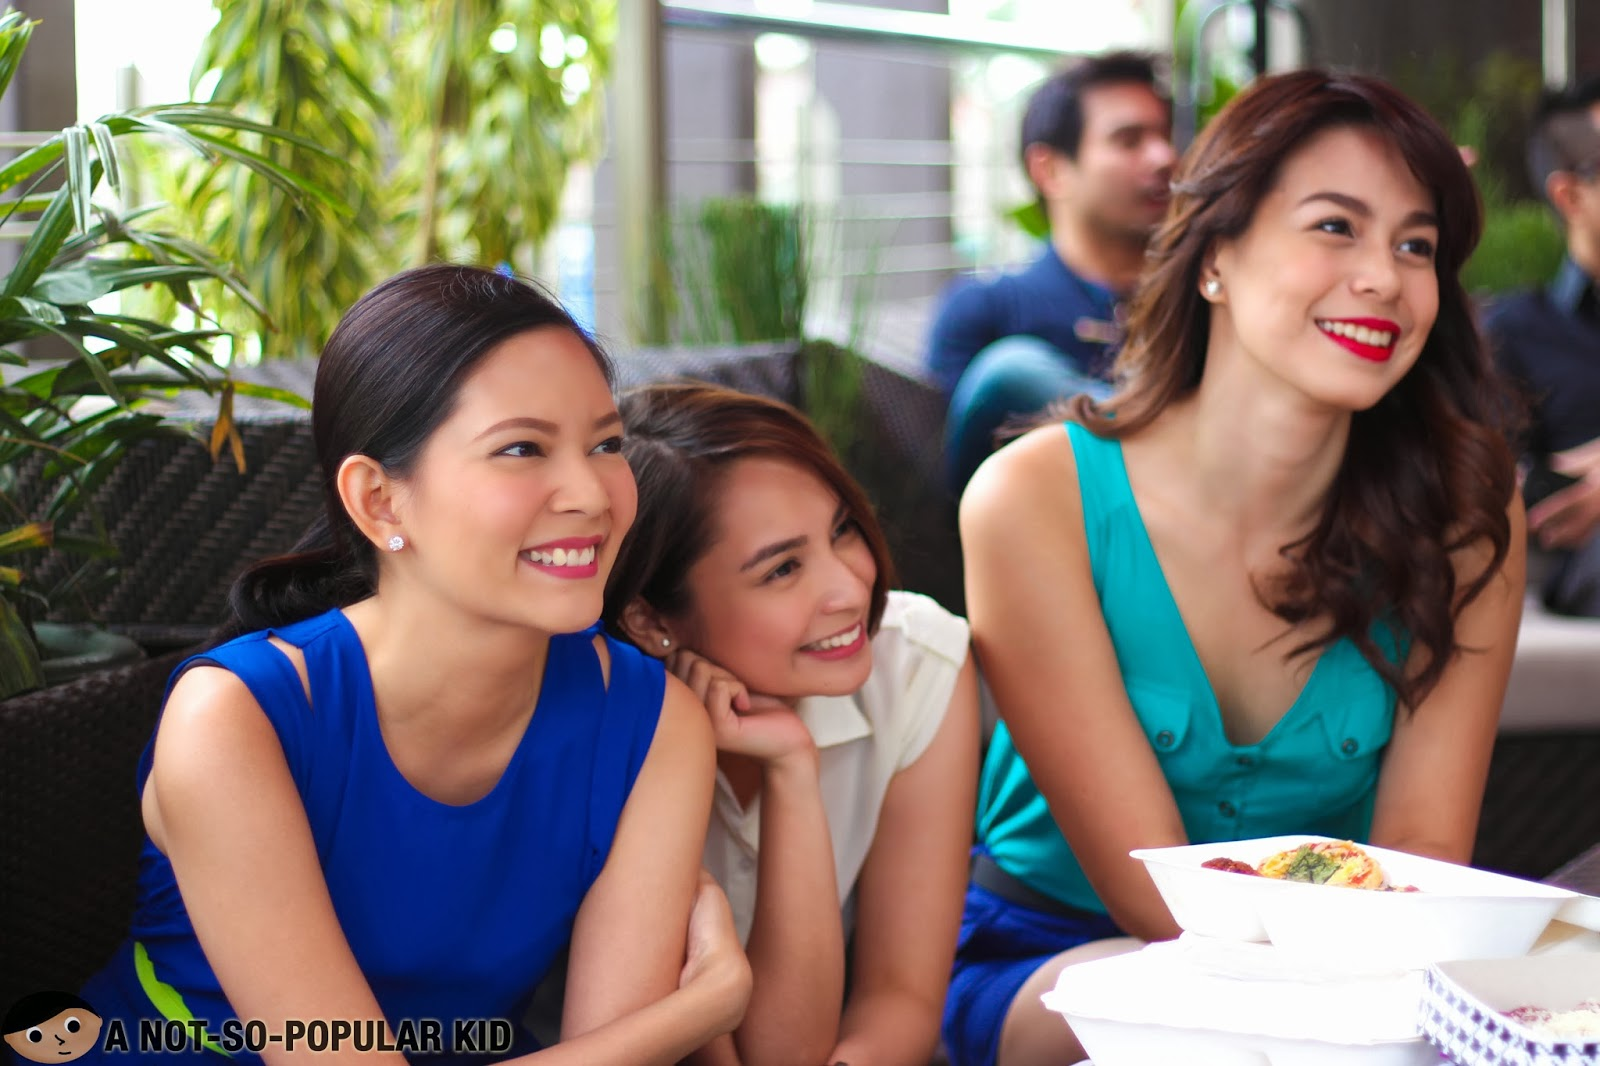 Food for the Heart featuring Chynna Ortaleza, Ryza Cenon and Bettinna Carlos